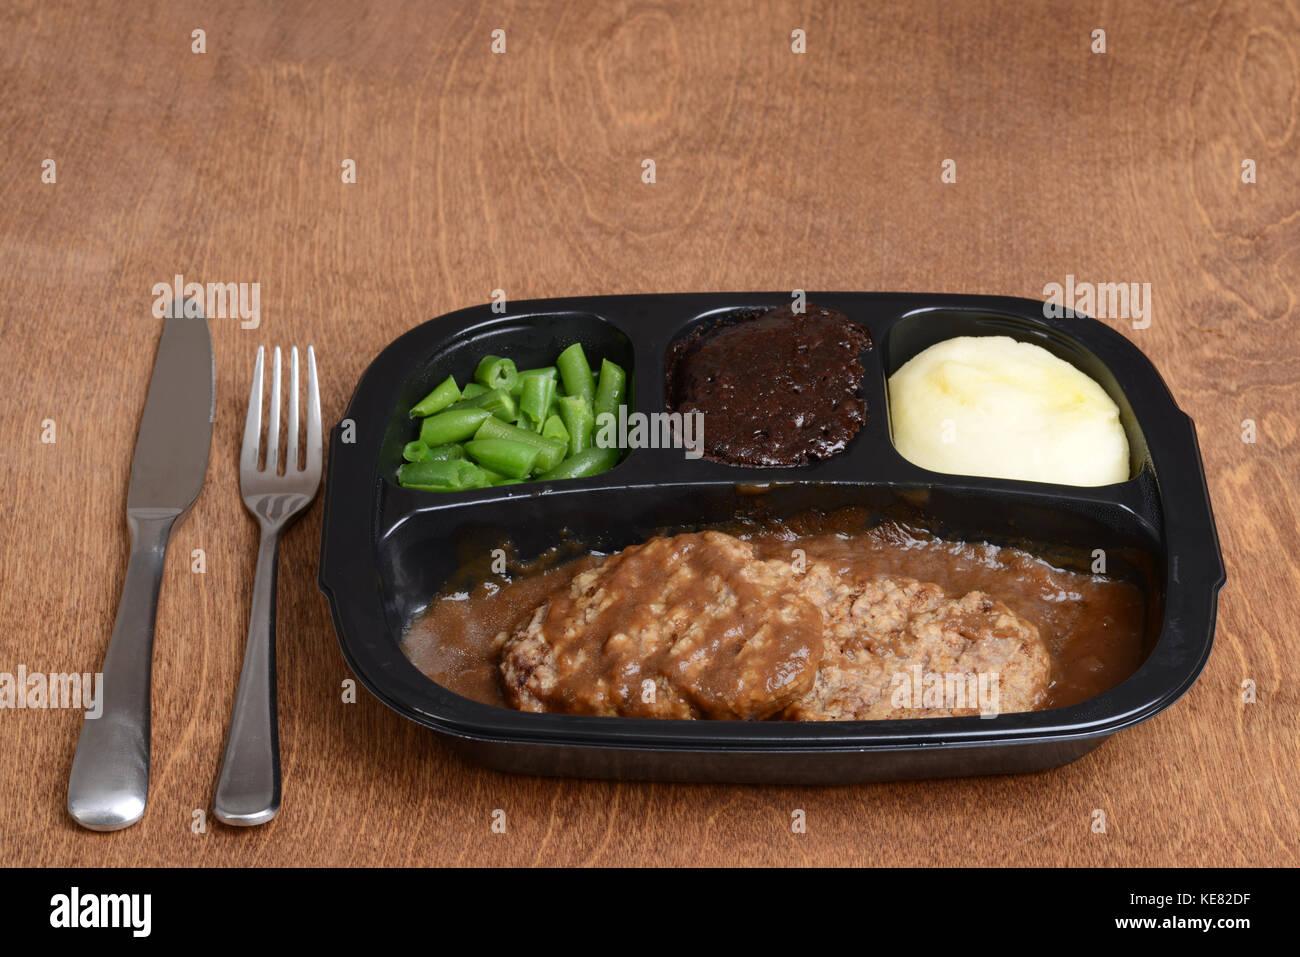 salisbury steak tv dinner - Stock Image